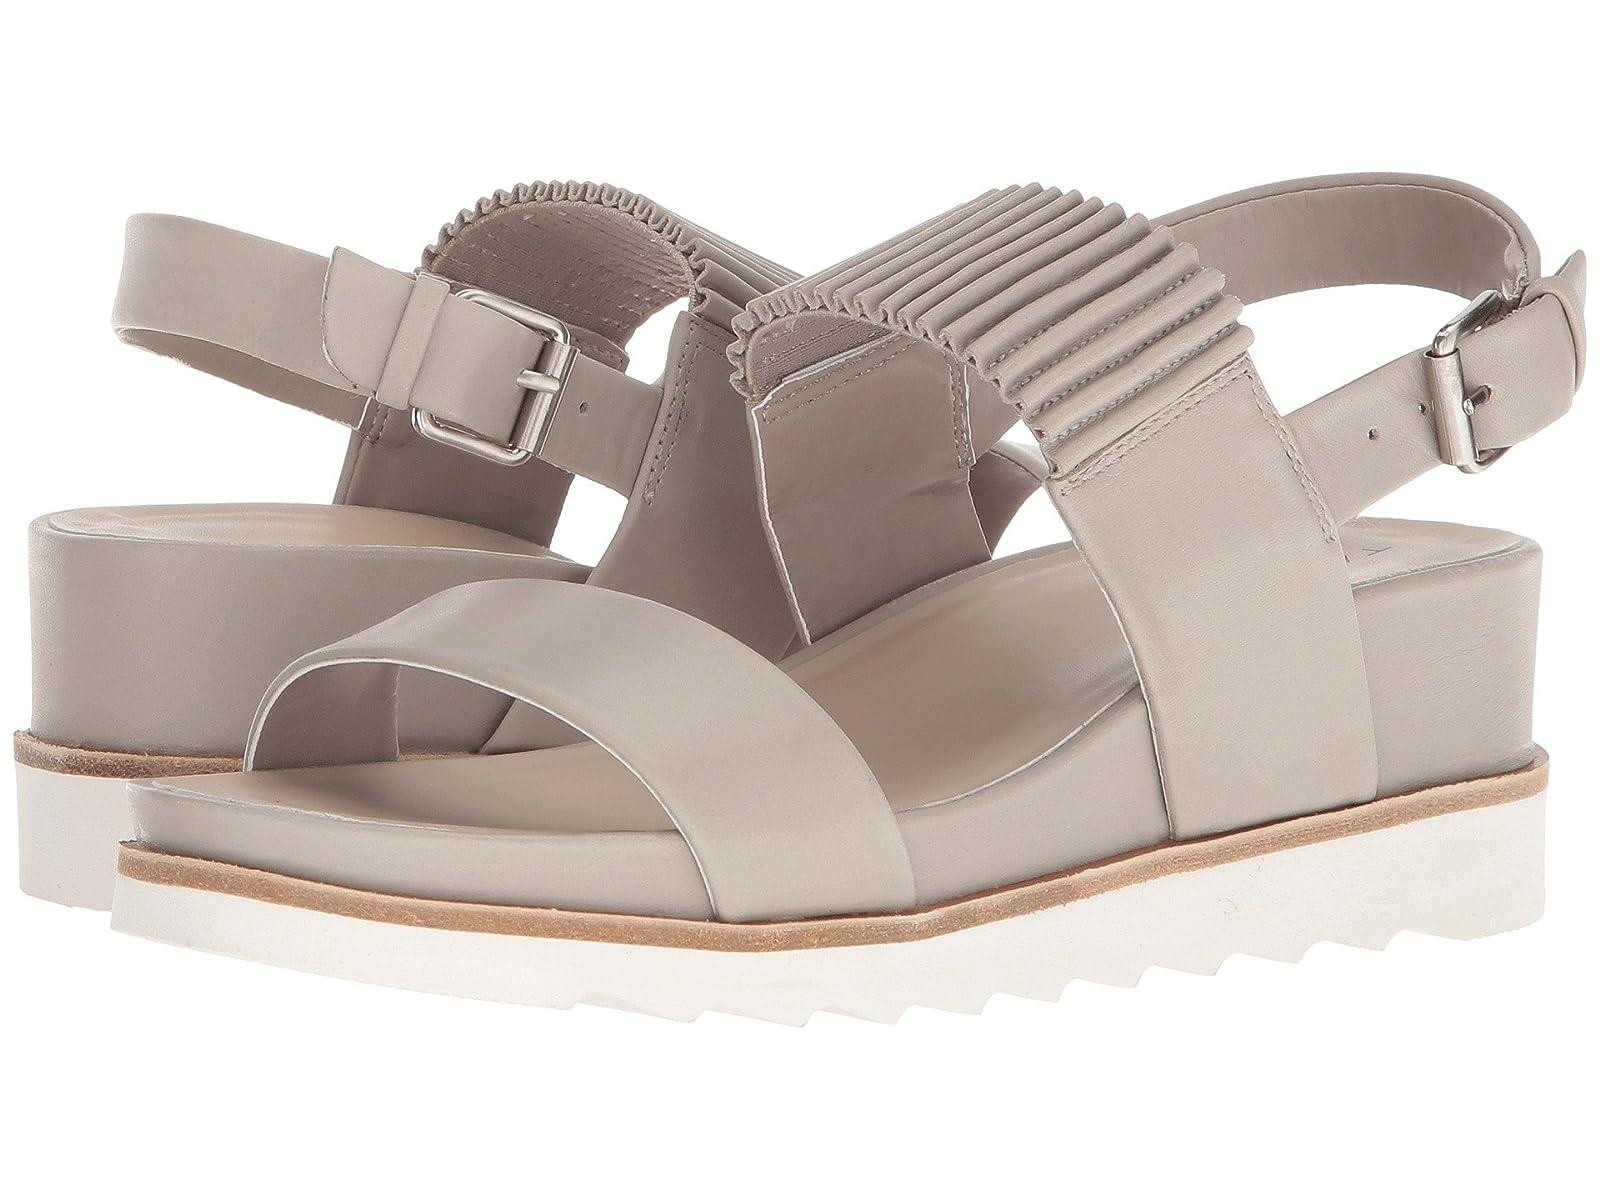 Tahari Giada SandalAtmospheric grades have affordable shoes